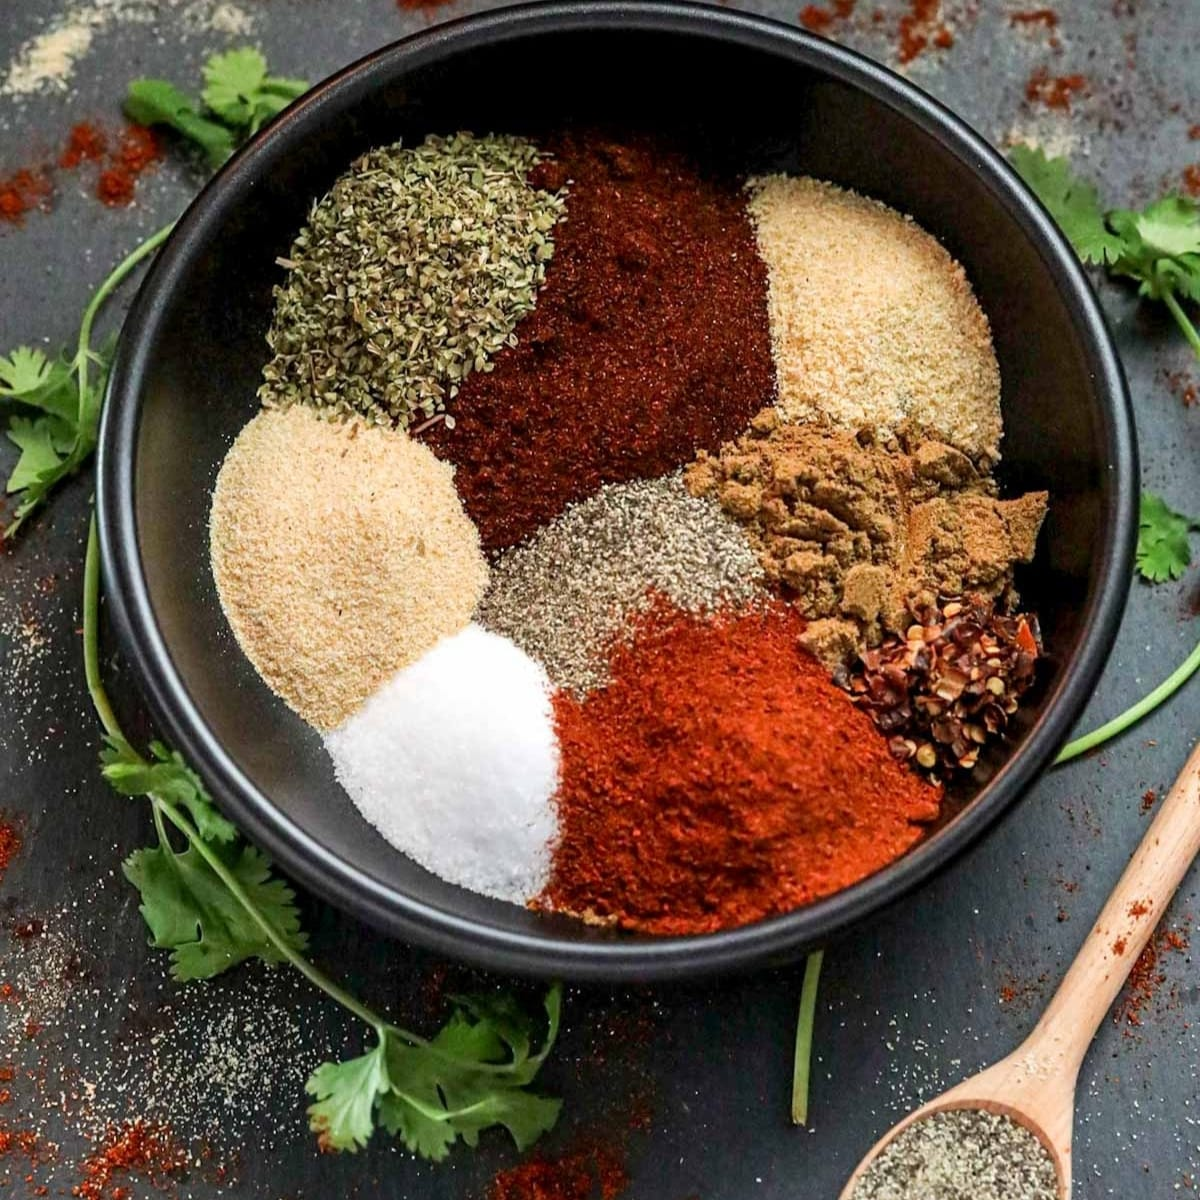 bowl full of spice blend for taco seasoning